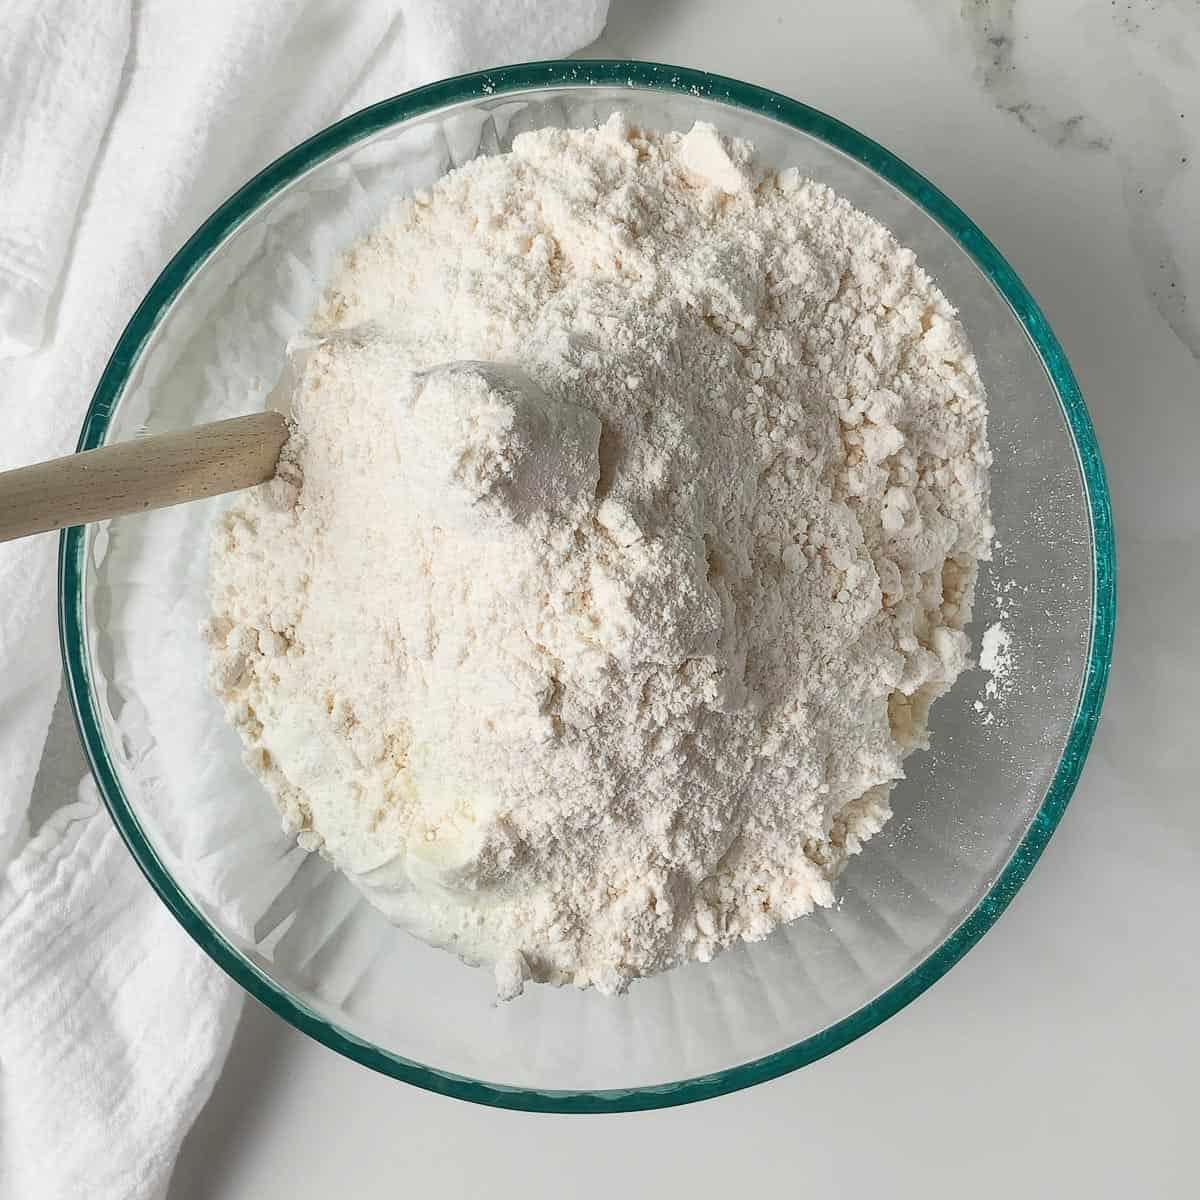 ingredients for dunkaroo dip in glass bowl before stirring